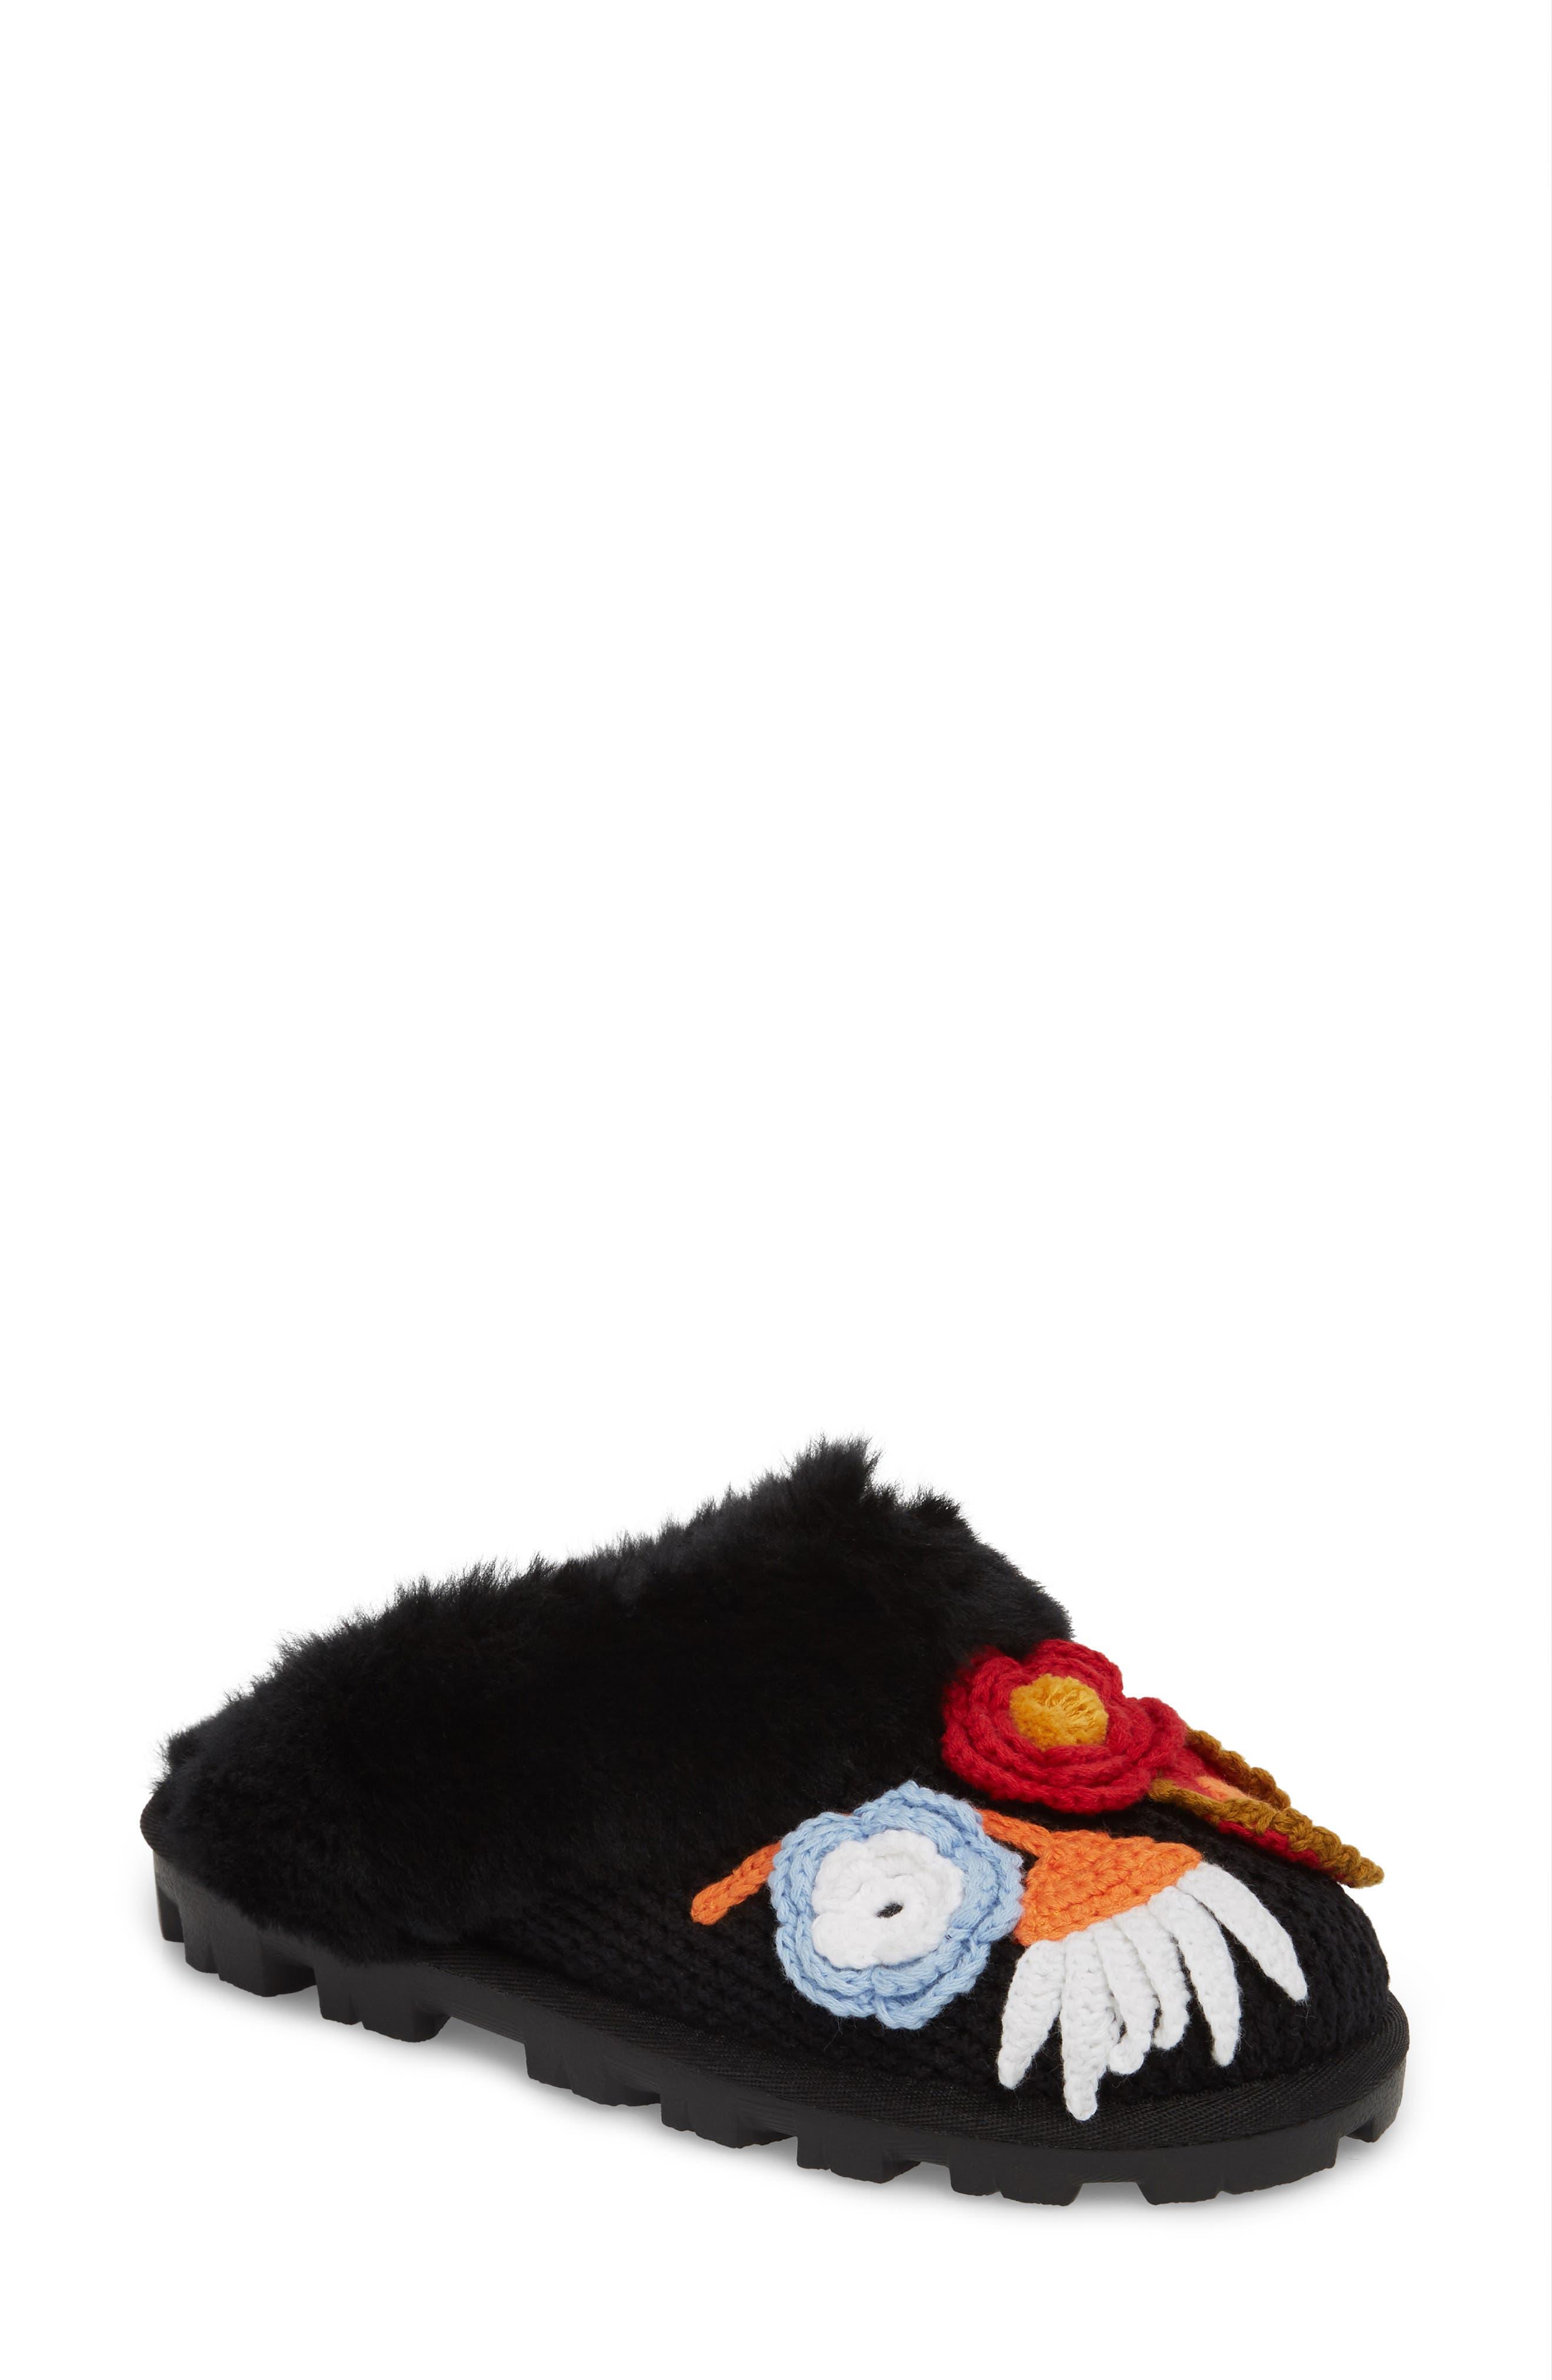 Crochet Genuine Shearling Slipper,                             Main thumbnail 1, color,                             Black